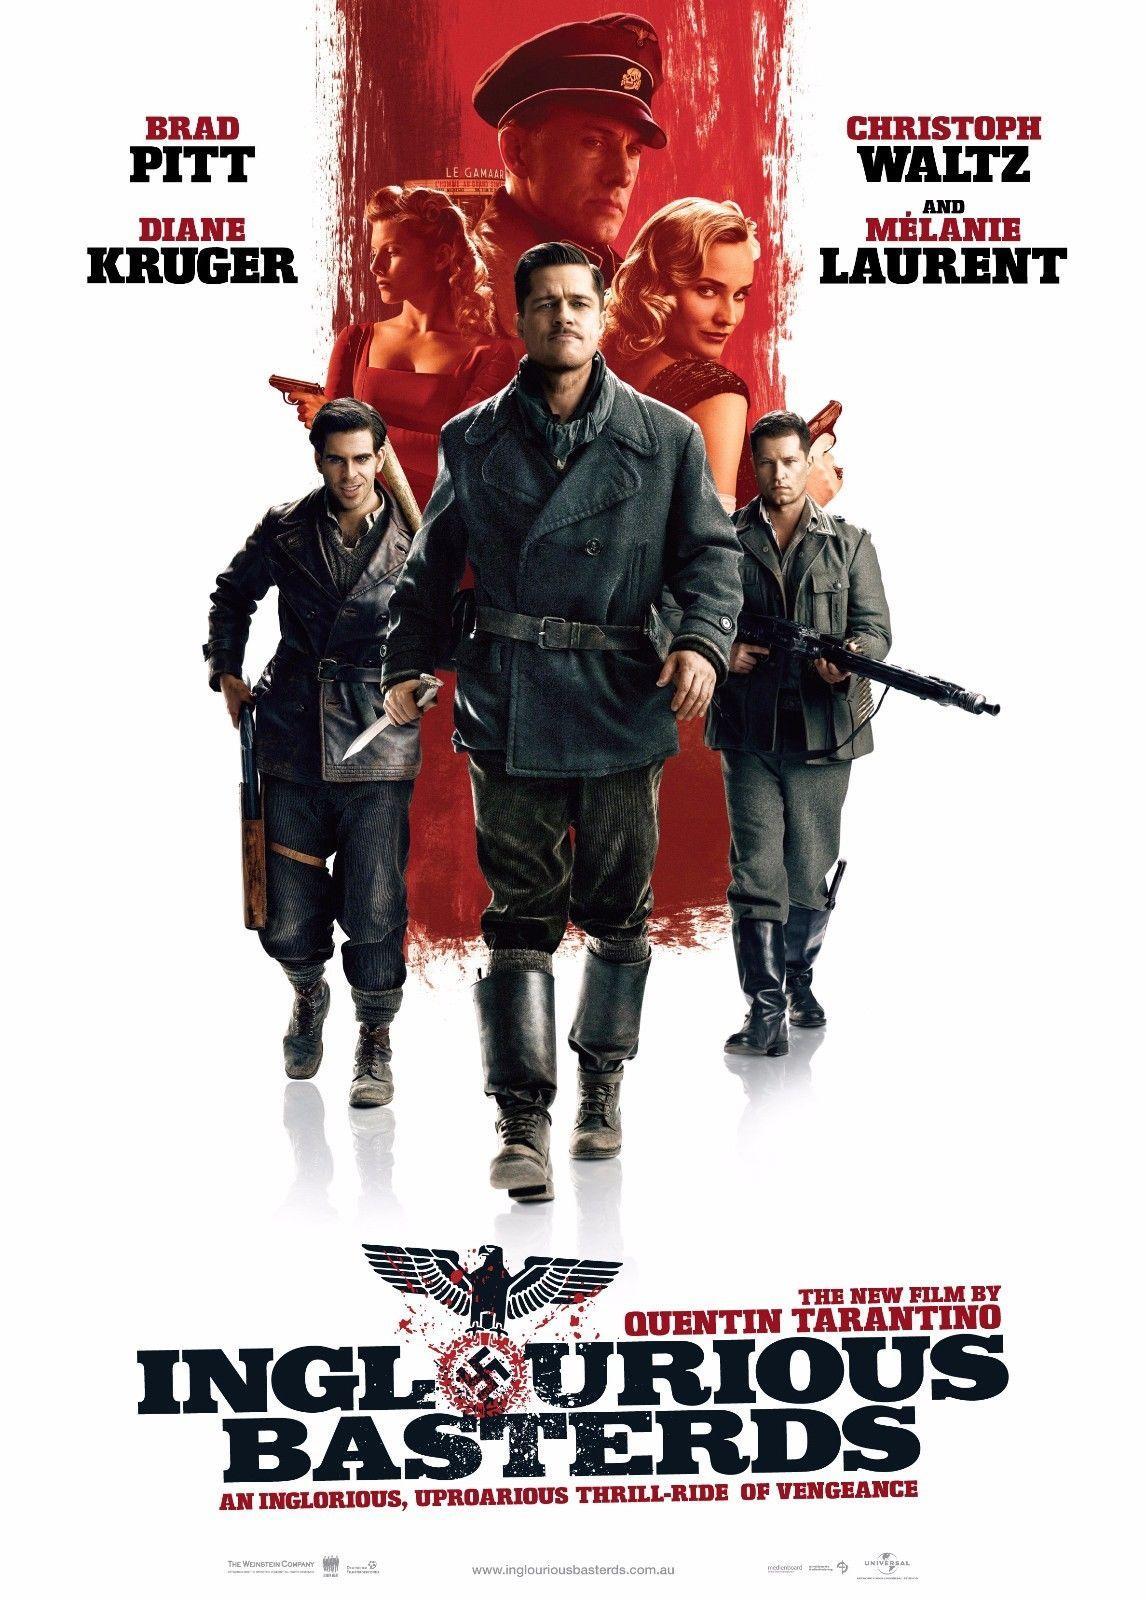 Compre Inglourious Basterds Filme Art Silk Poster 20x30 24x36 ...